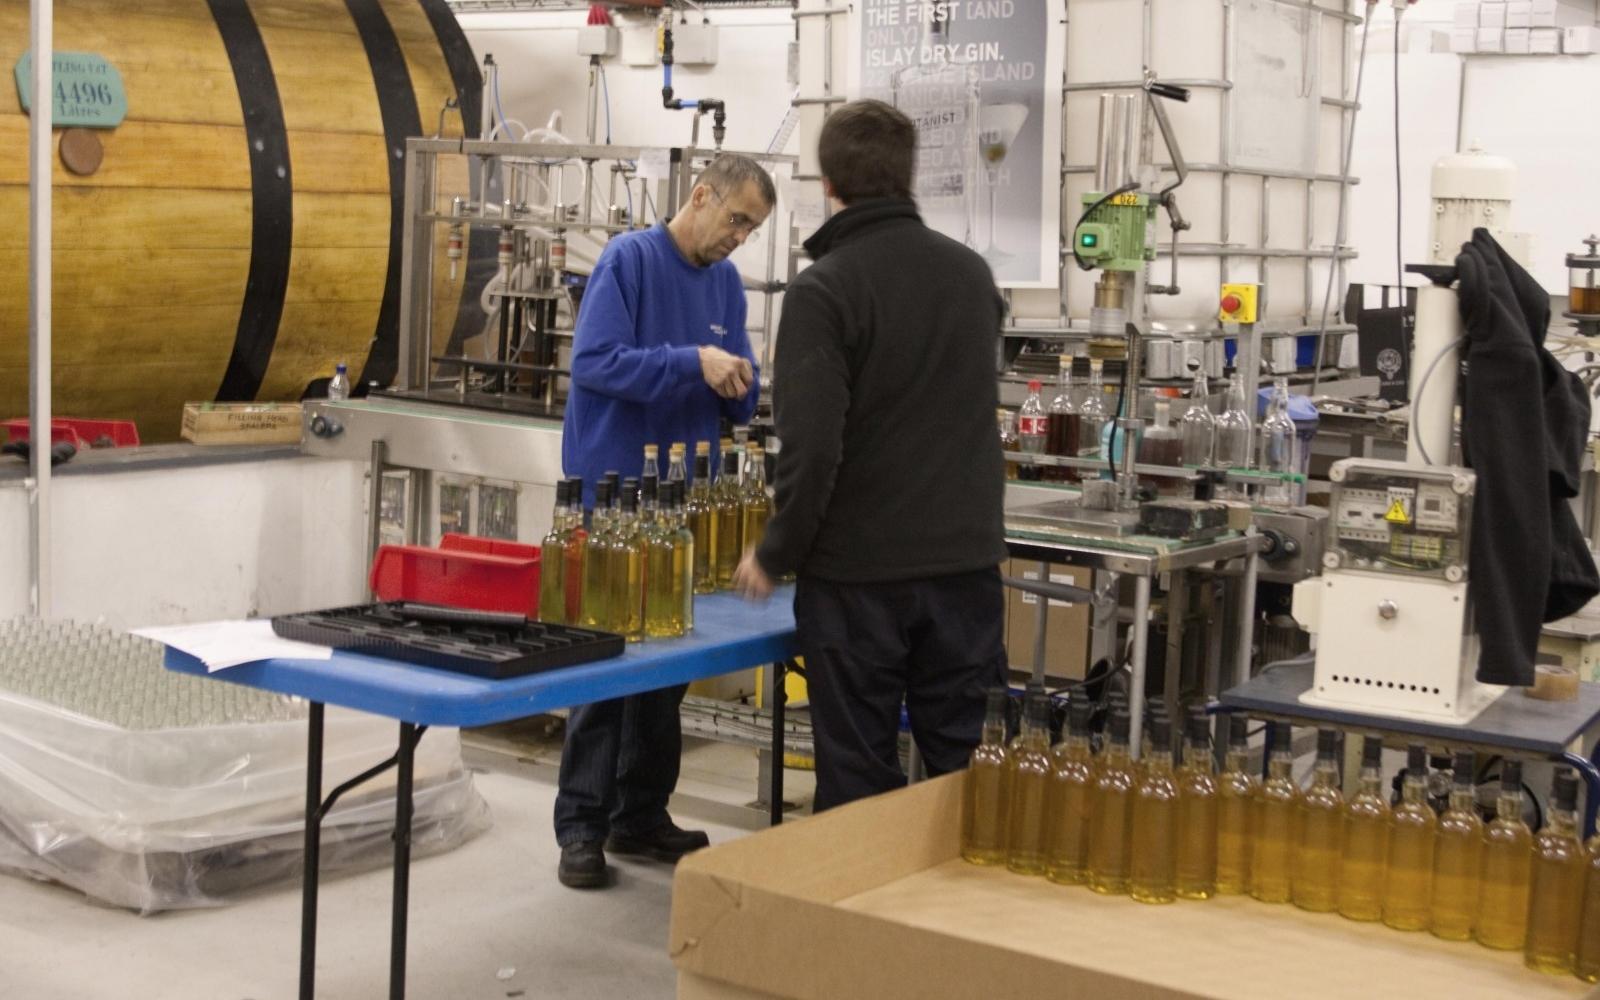 Inserting corks in bottles of Bruichladdich Whisky - Photo: Flickr/ Michael McKechnie